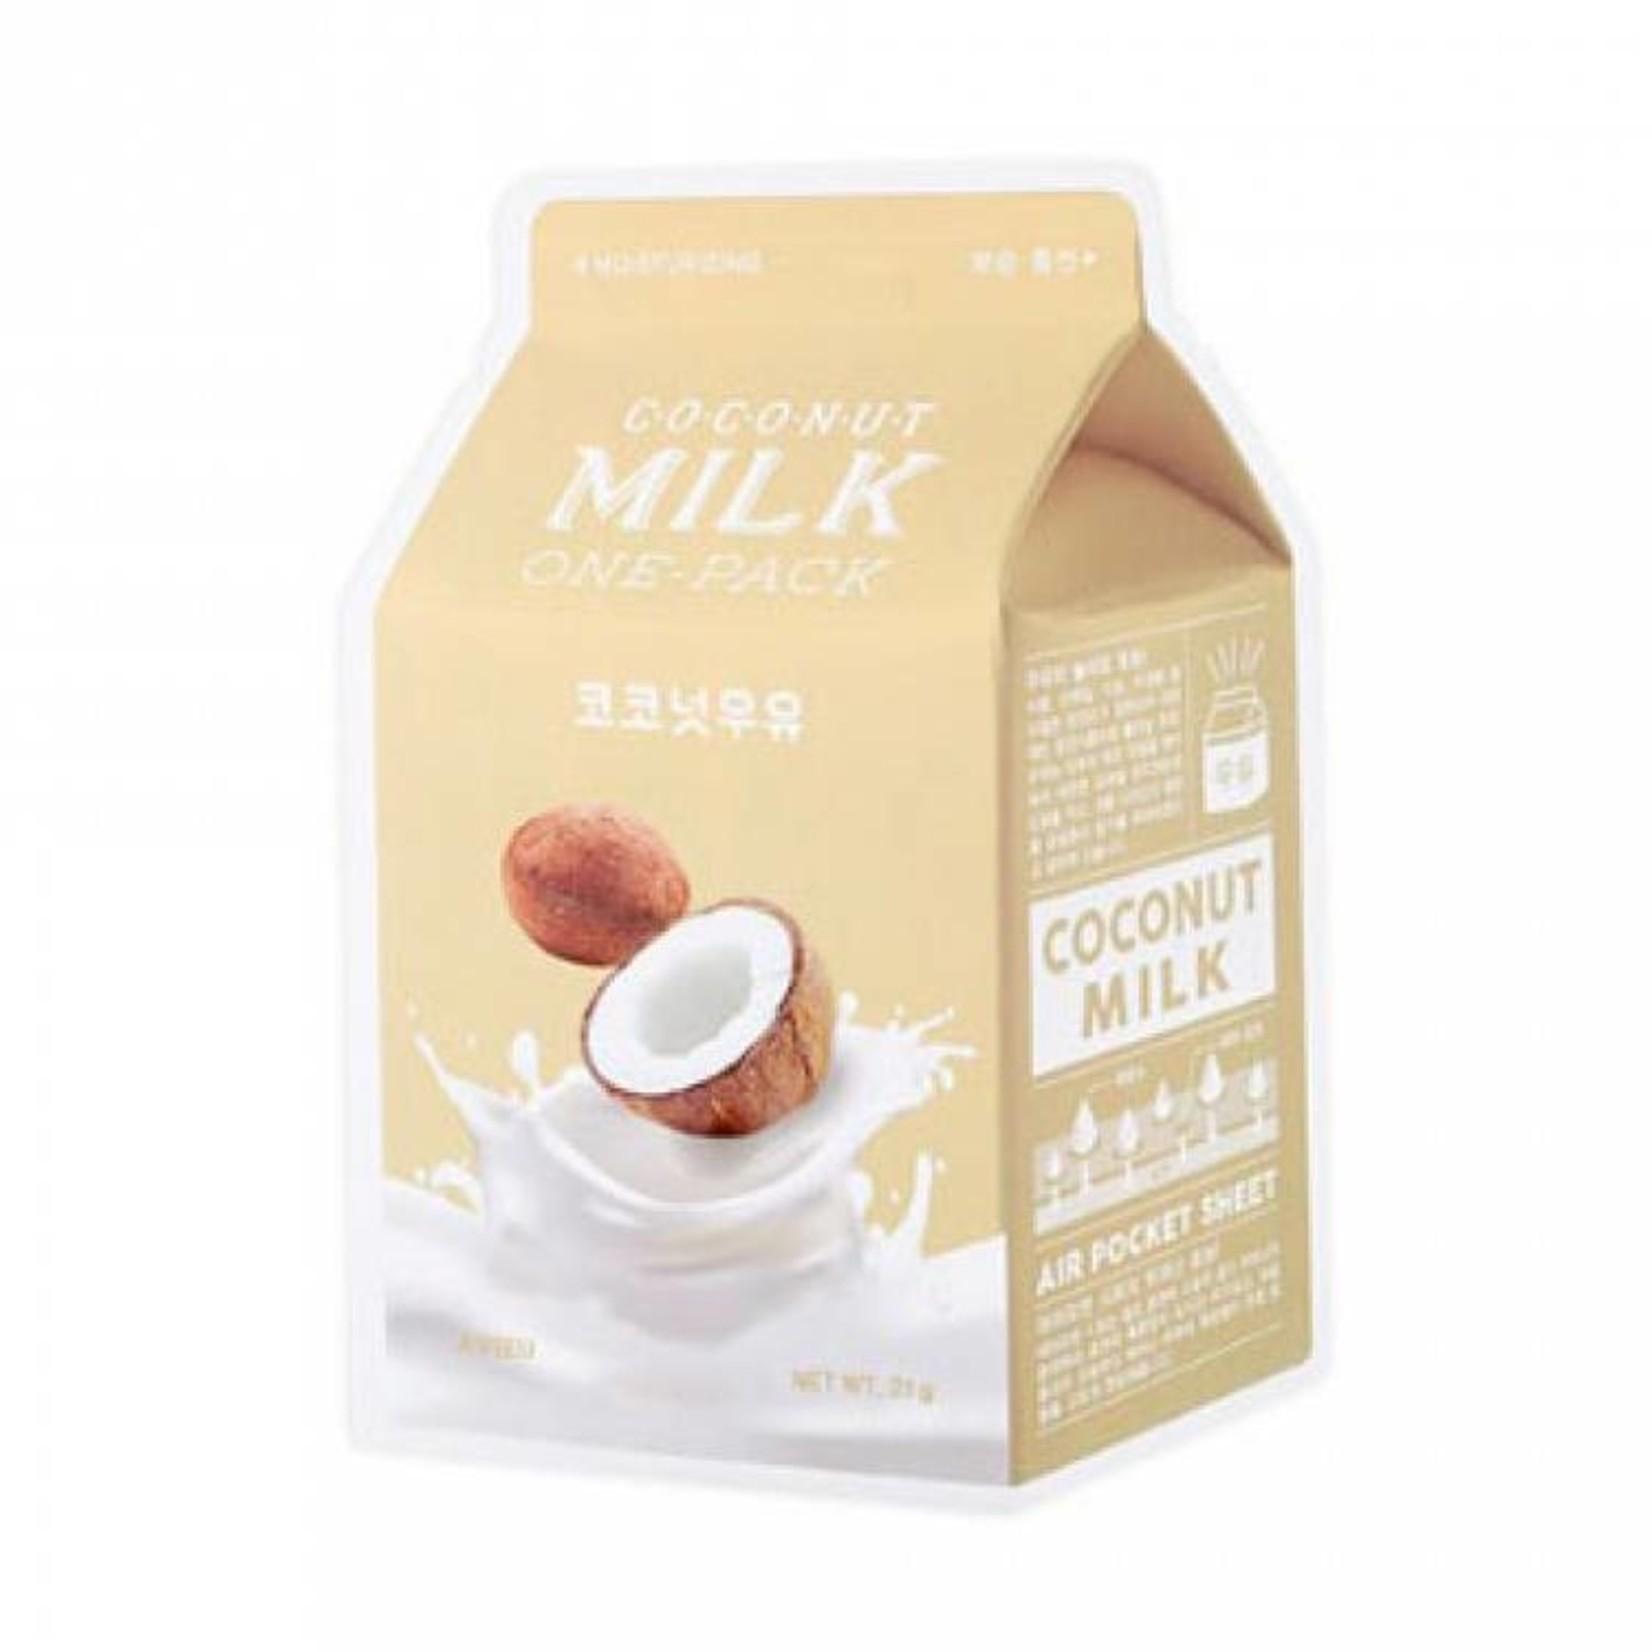 A'pieu Coconut Milk One Pack Mask 10 pcs